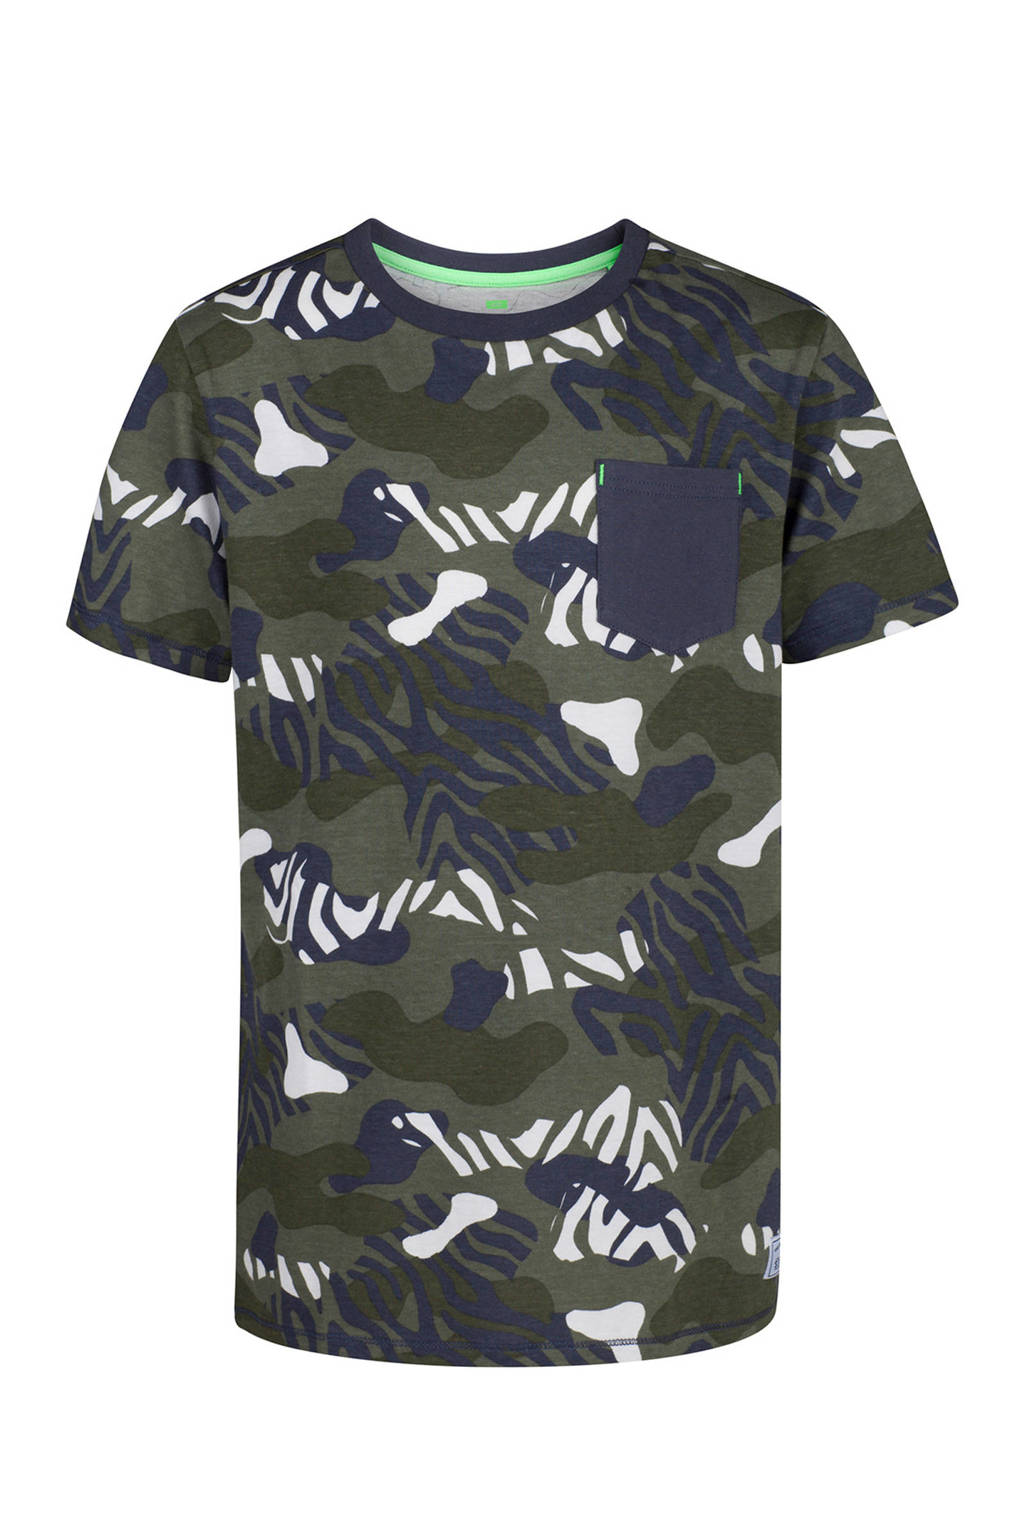 WE Fashion T-shirt met camouflageprint kaki/blauw